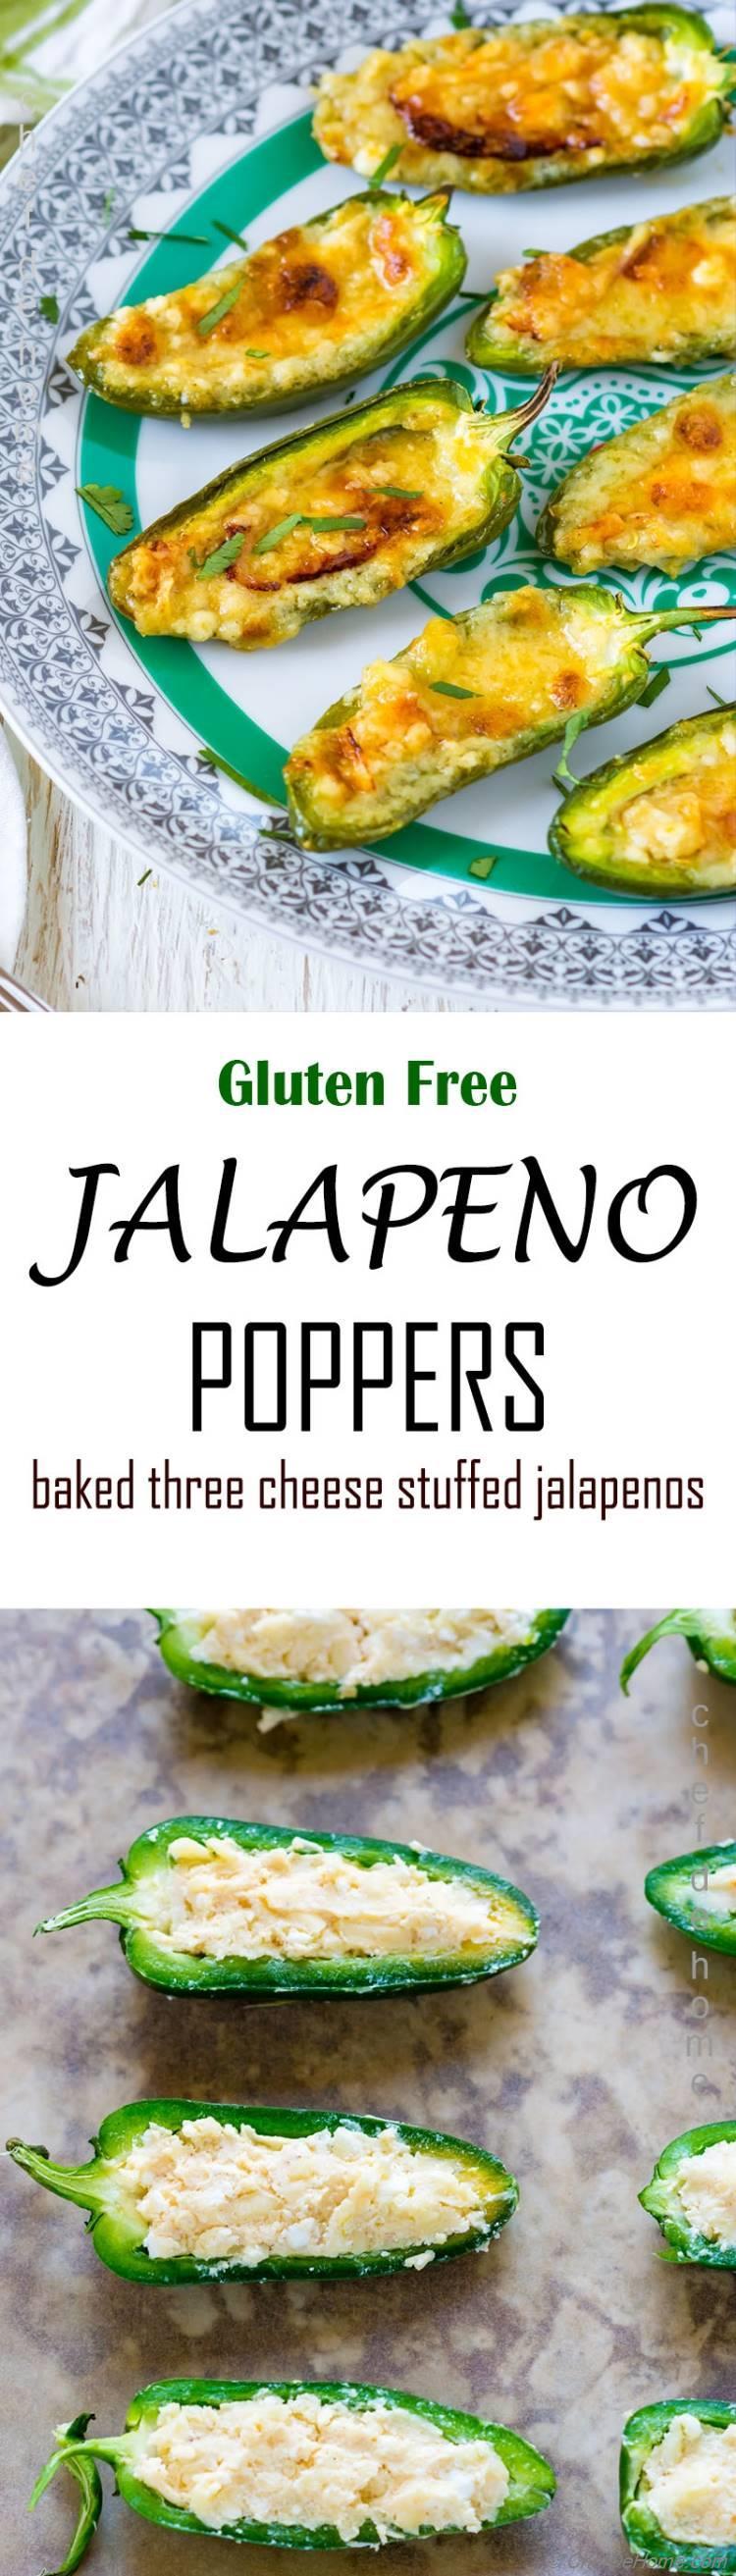 Baked Gluten Free Stuffed Jalapeno Poppers